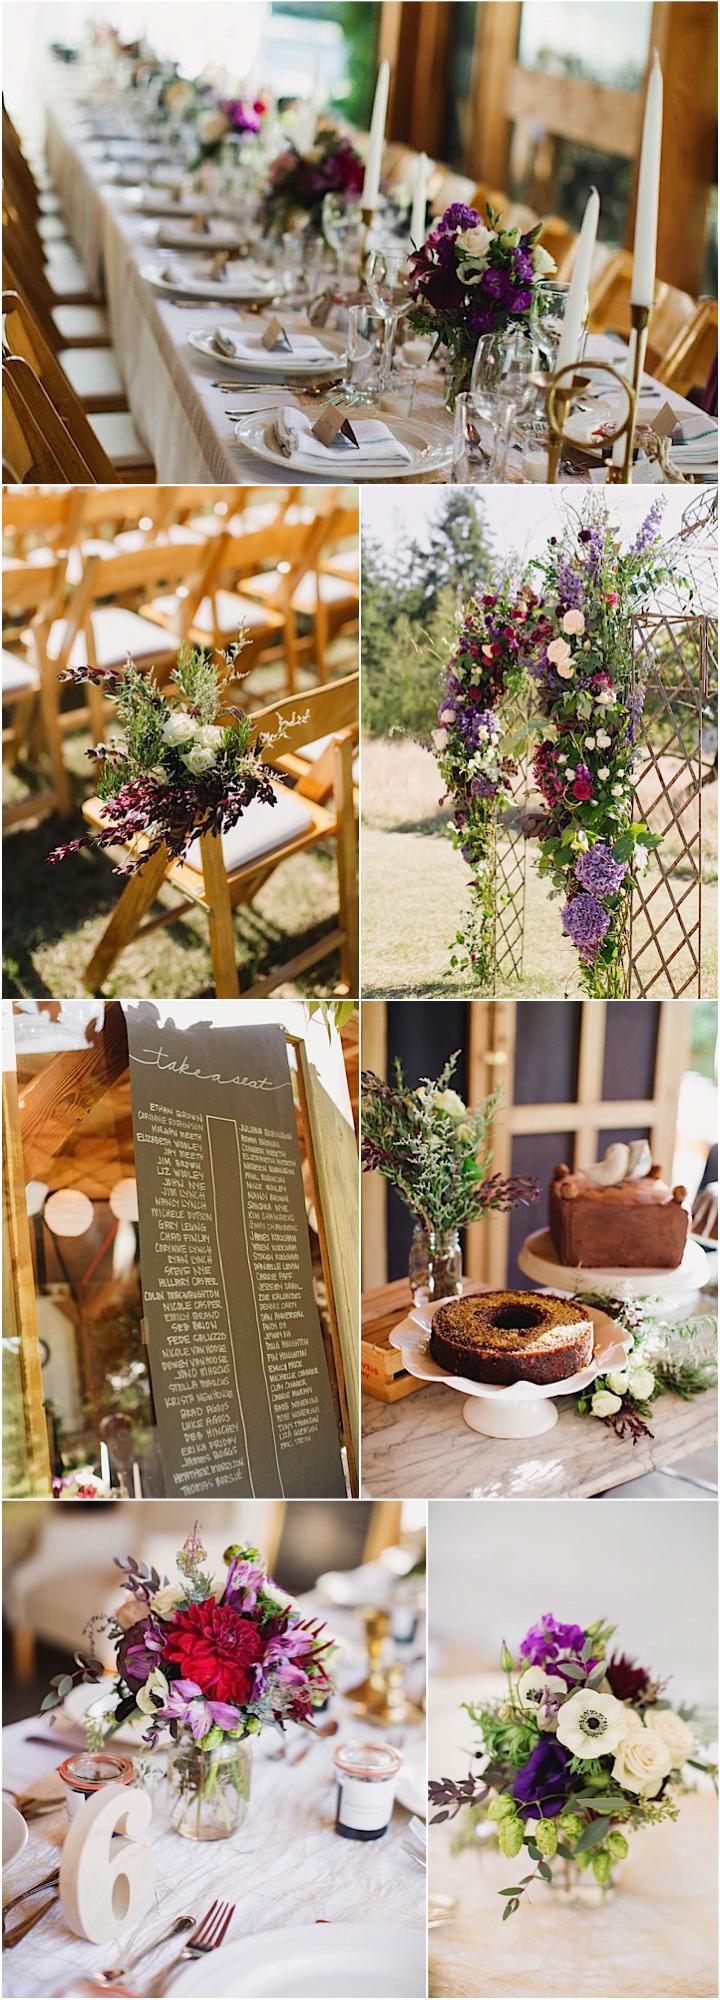 Lilac wedding decoration ideas  A Rustic Chic Washington Wedding  Purple rustic weddings Theme